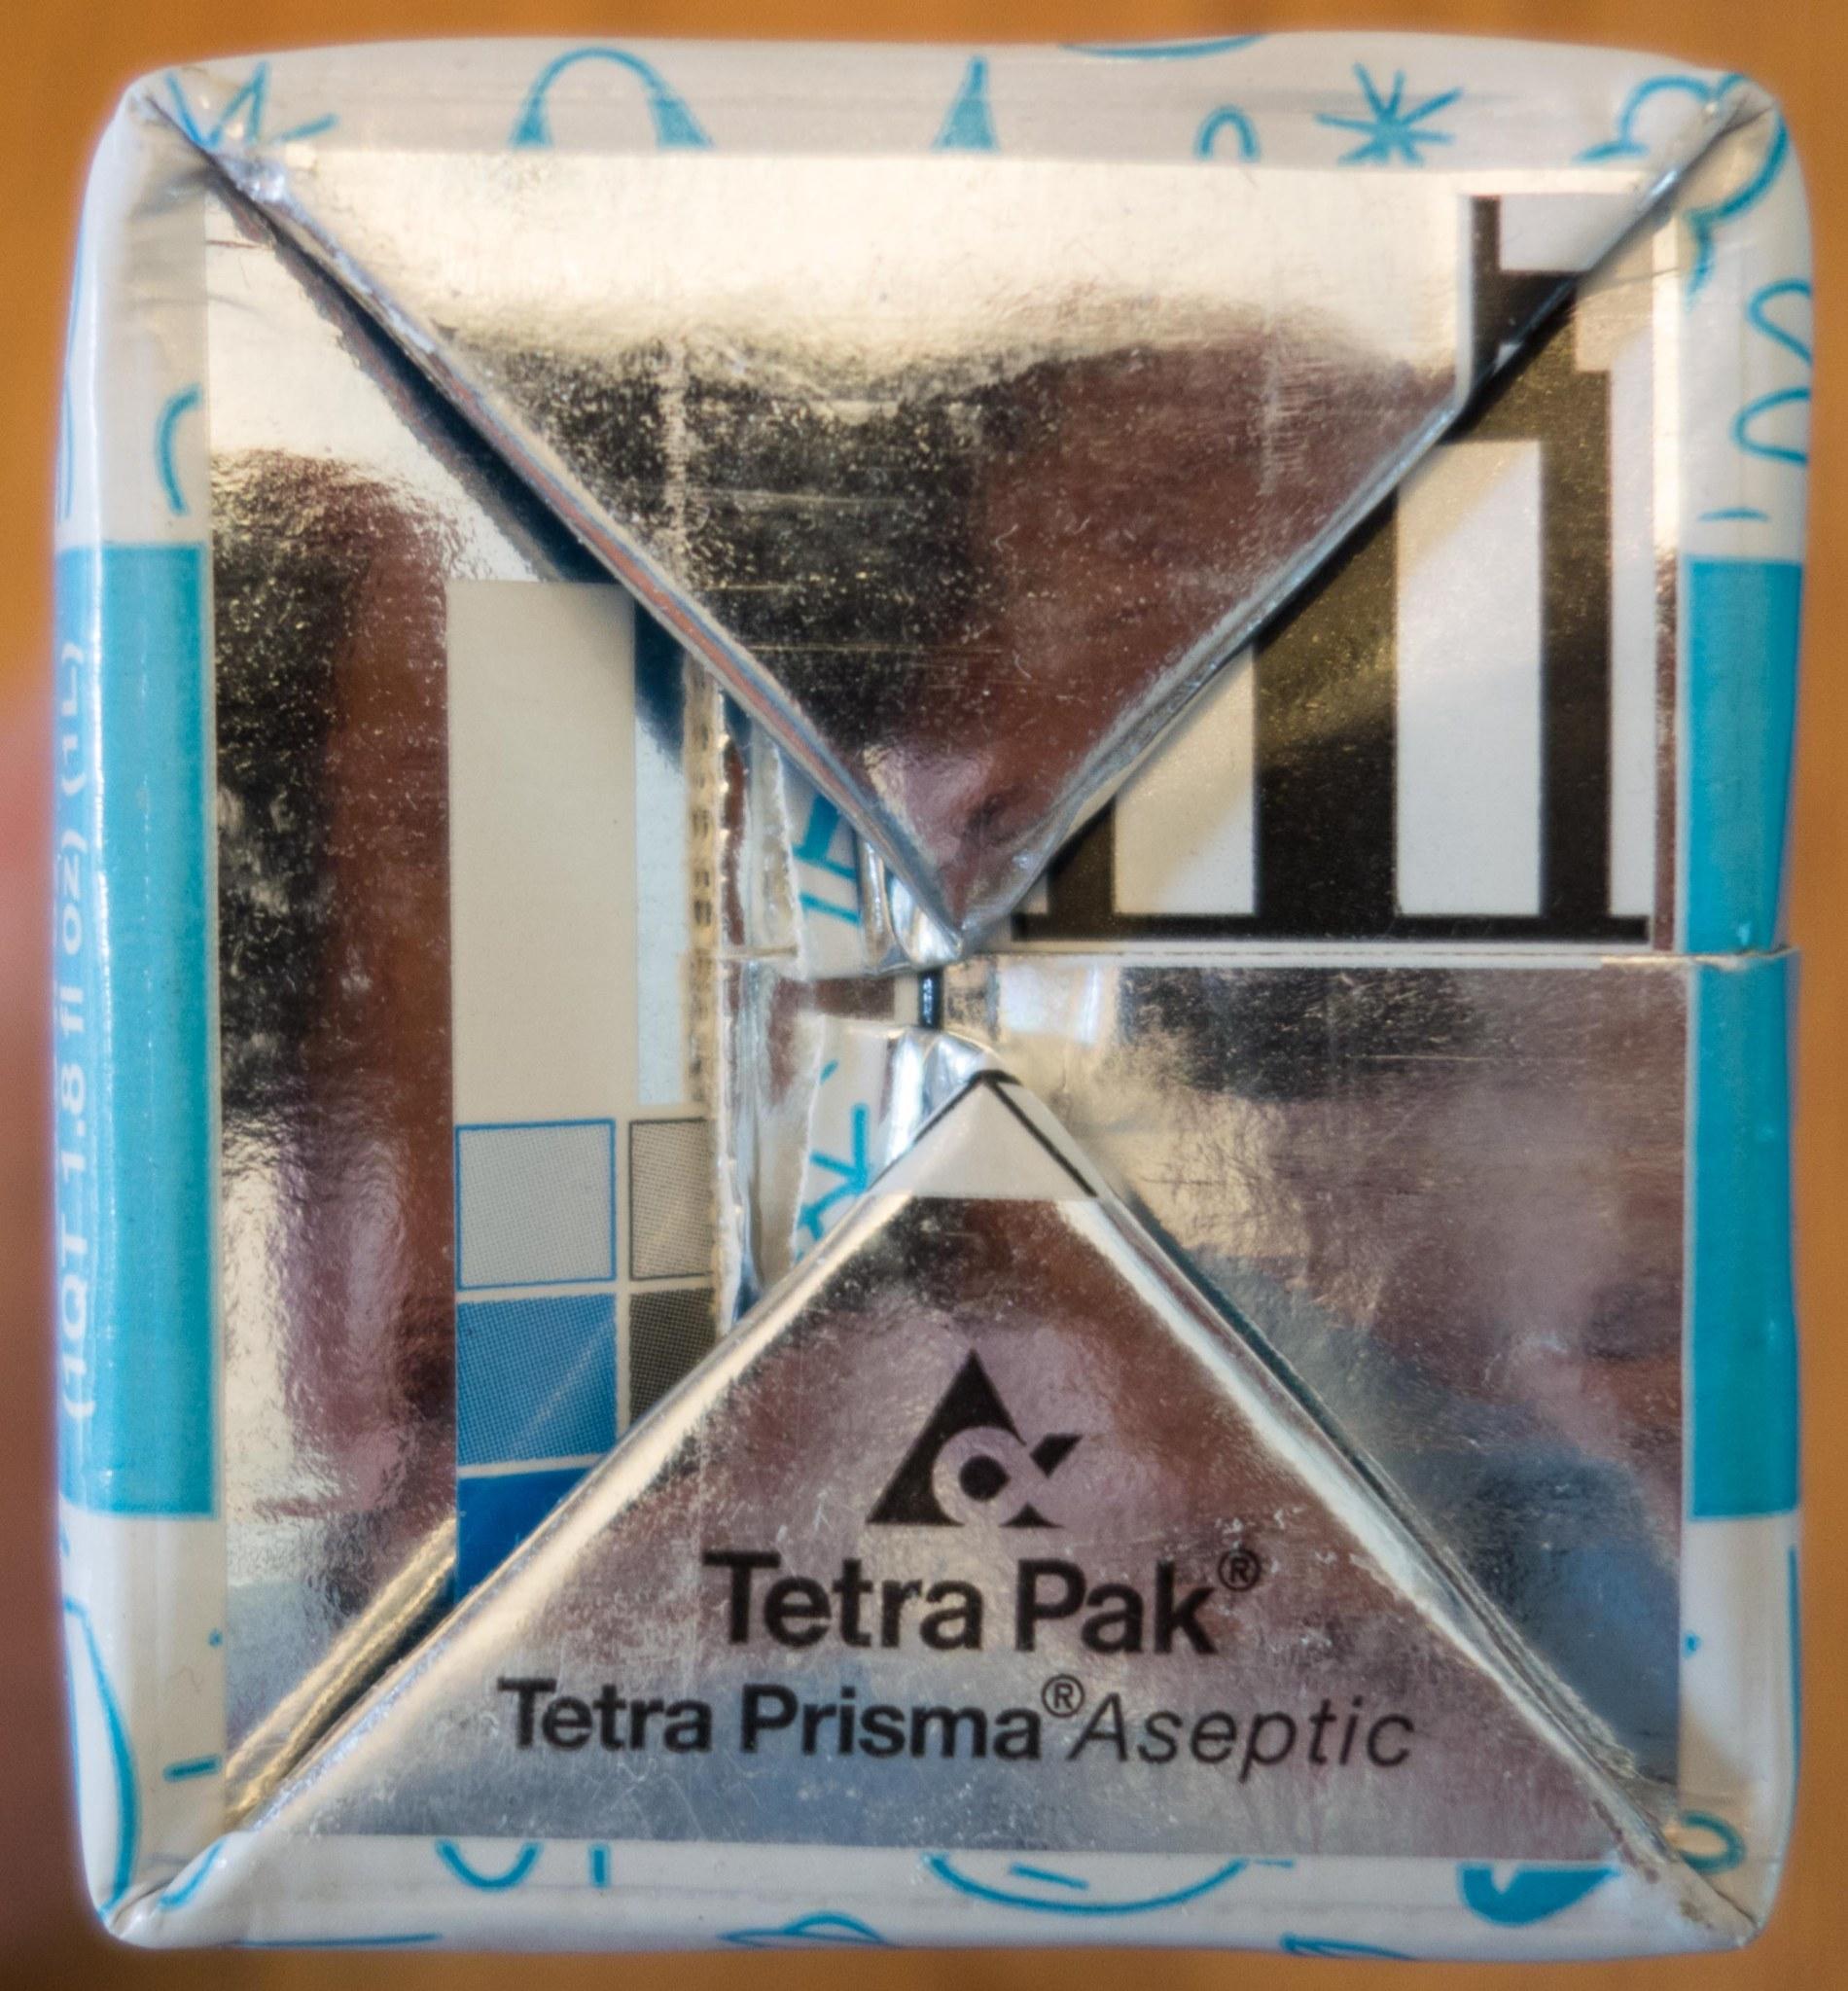 Rethink water Tetra Pak Tetra Prisma D.D.Teoli Jr. 5